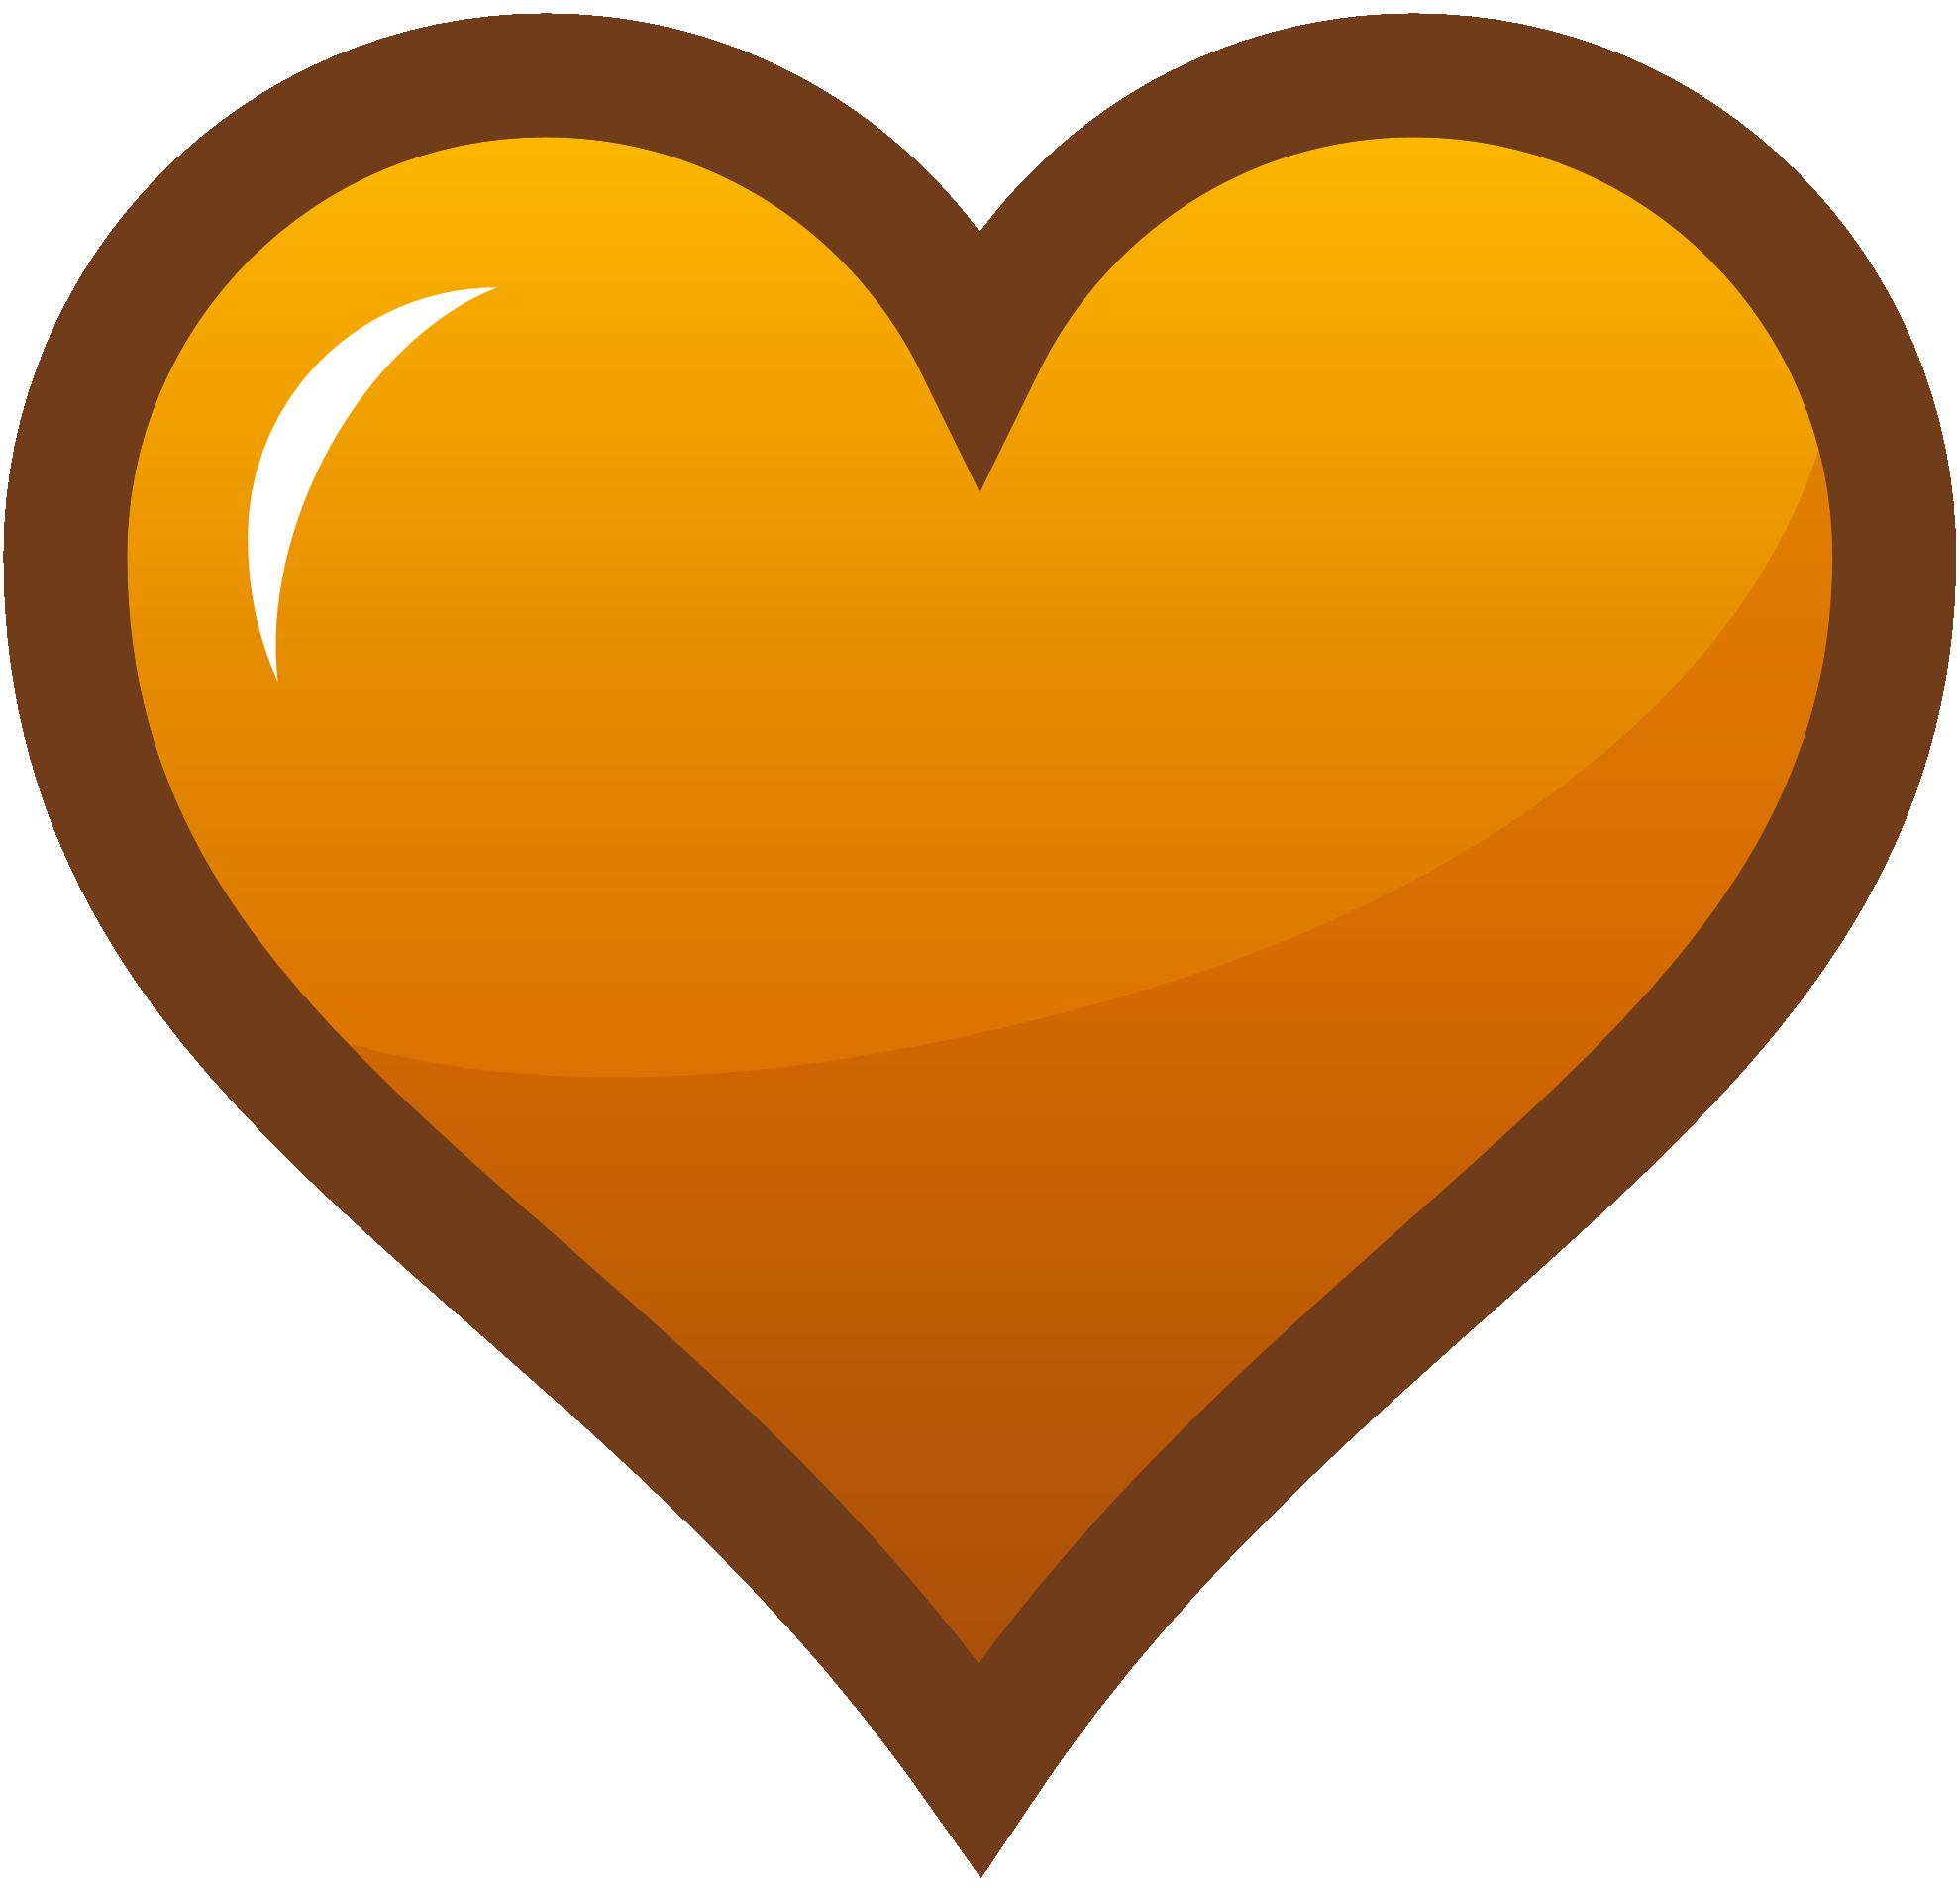 Hearts clipart icon Orange Clipart Orange Thanksgiving Clipart